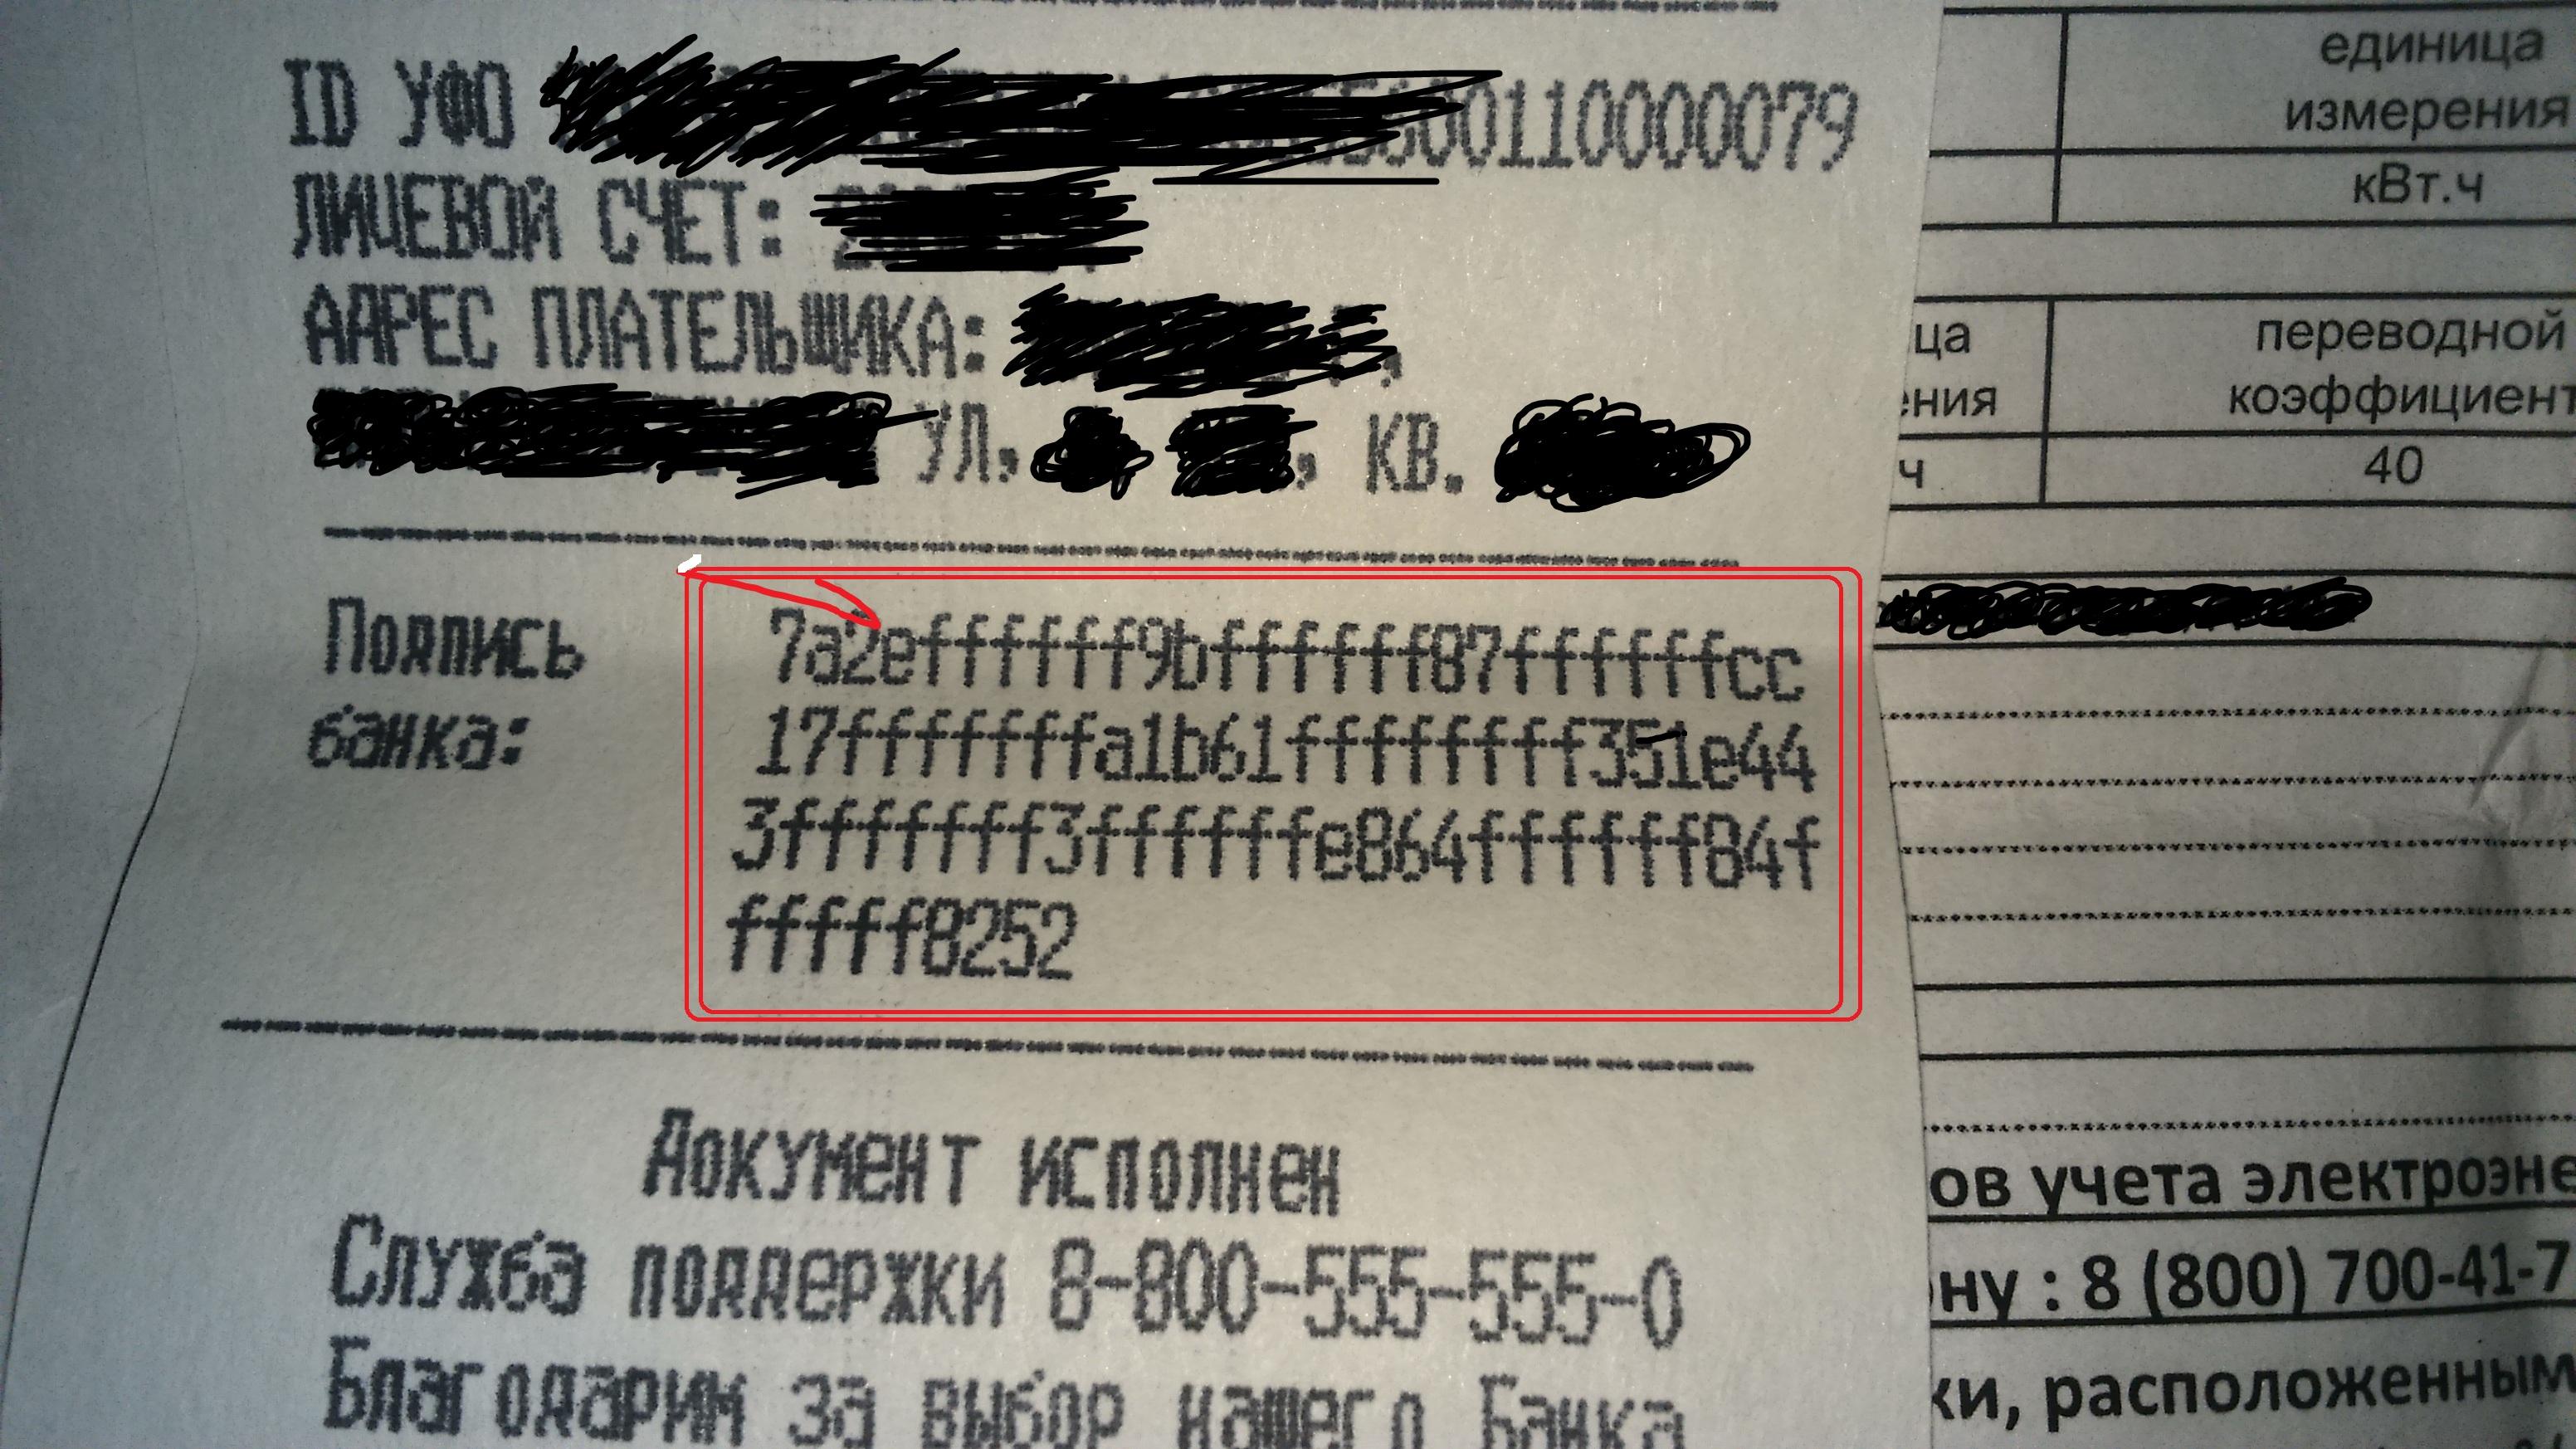 http://se.uploads.ru/5r9s2.jpg